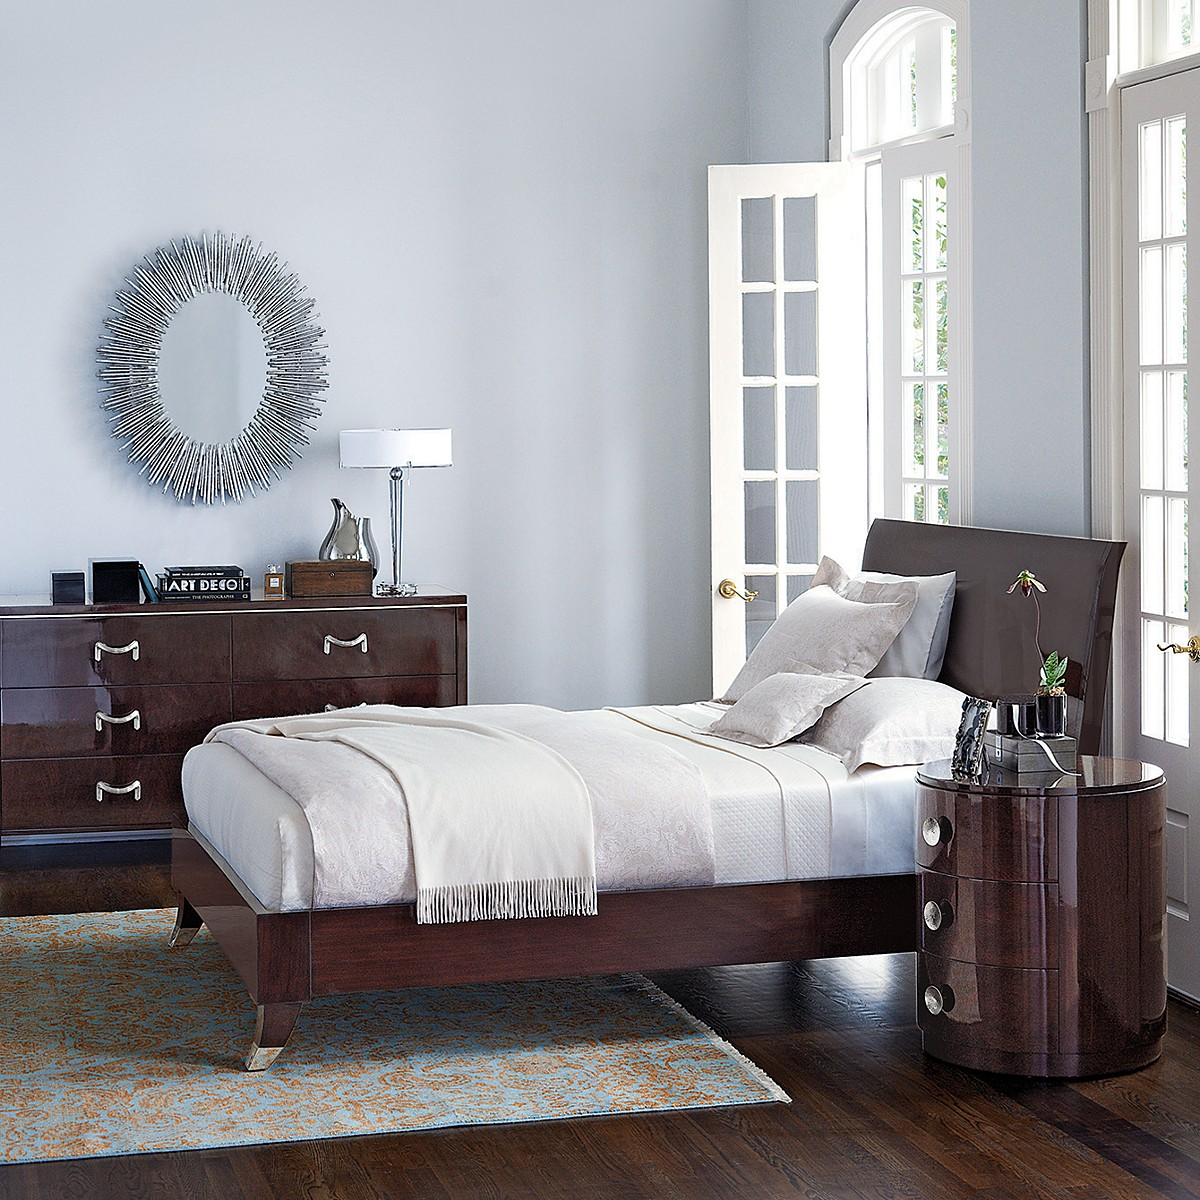 Bloomingdale S Savoy Bedroom Collection 100 Exclusive